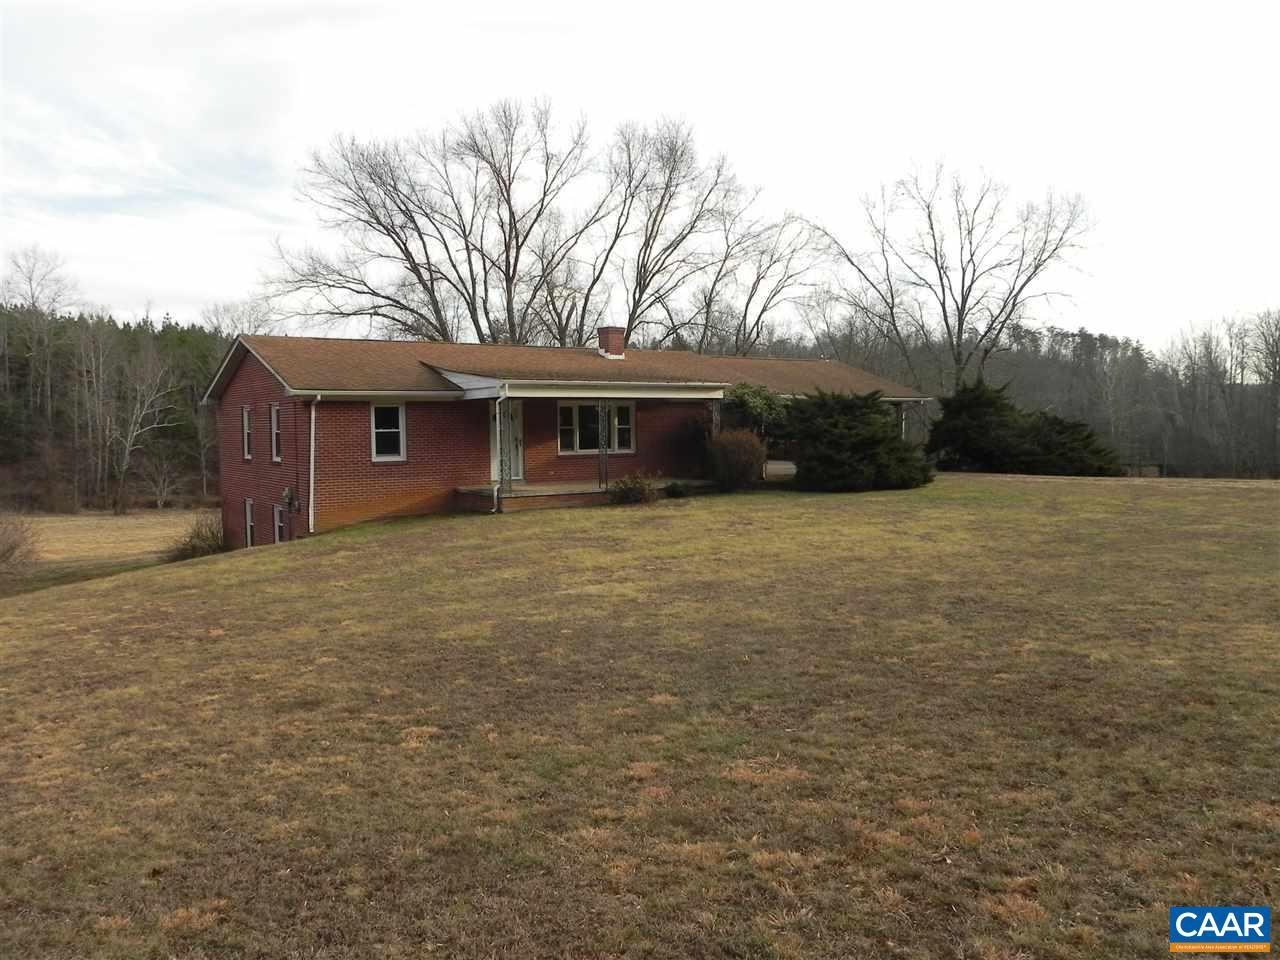 home for sale , MLS #571599, 4761 Irish Rd